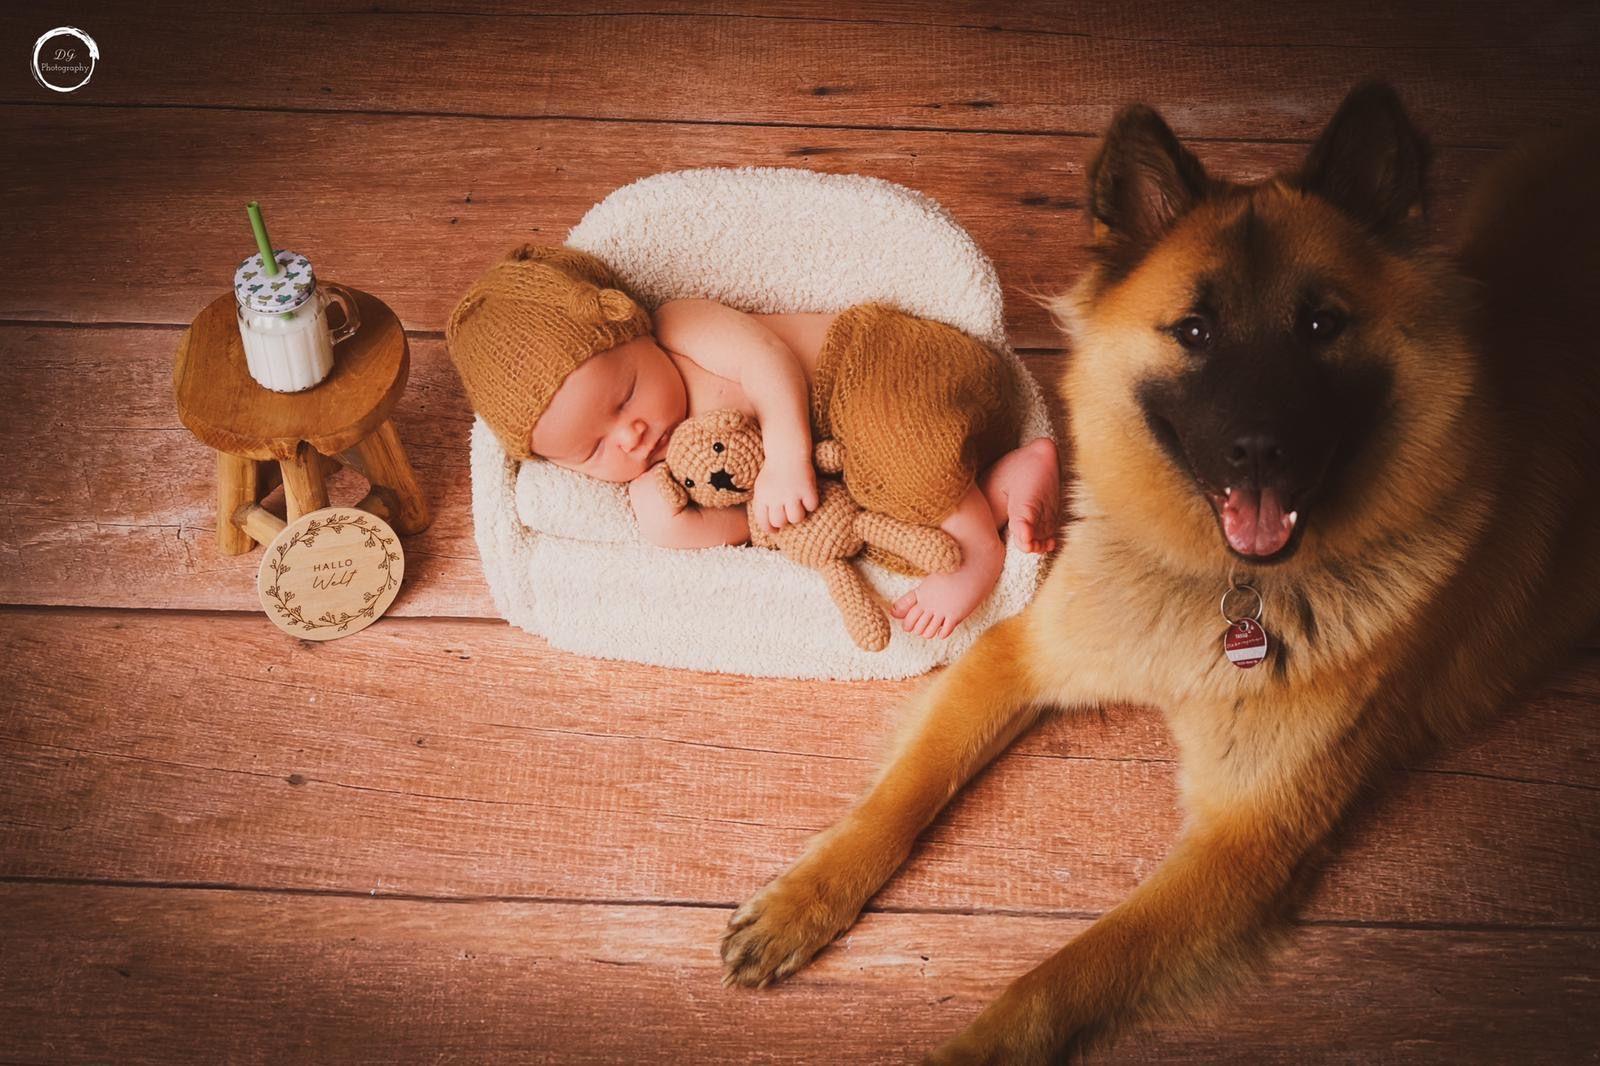 2020-10-16-Kyras-Familie-II-mit-Ellie